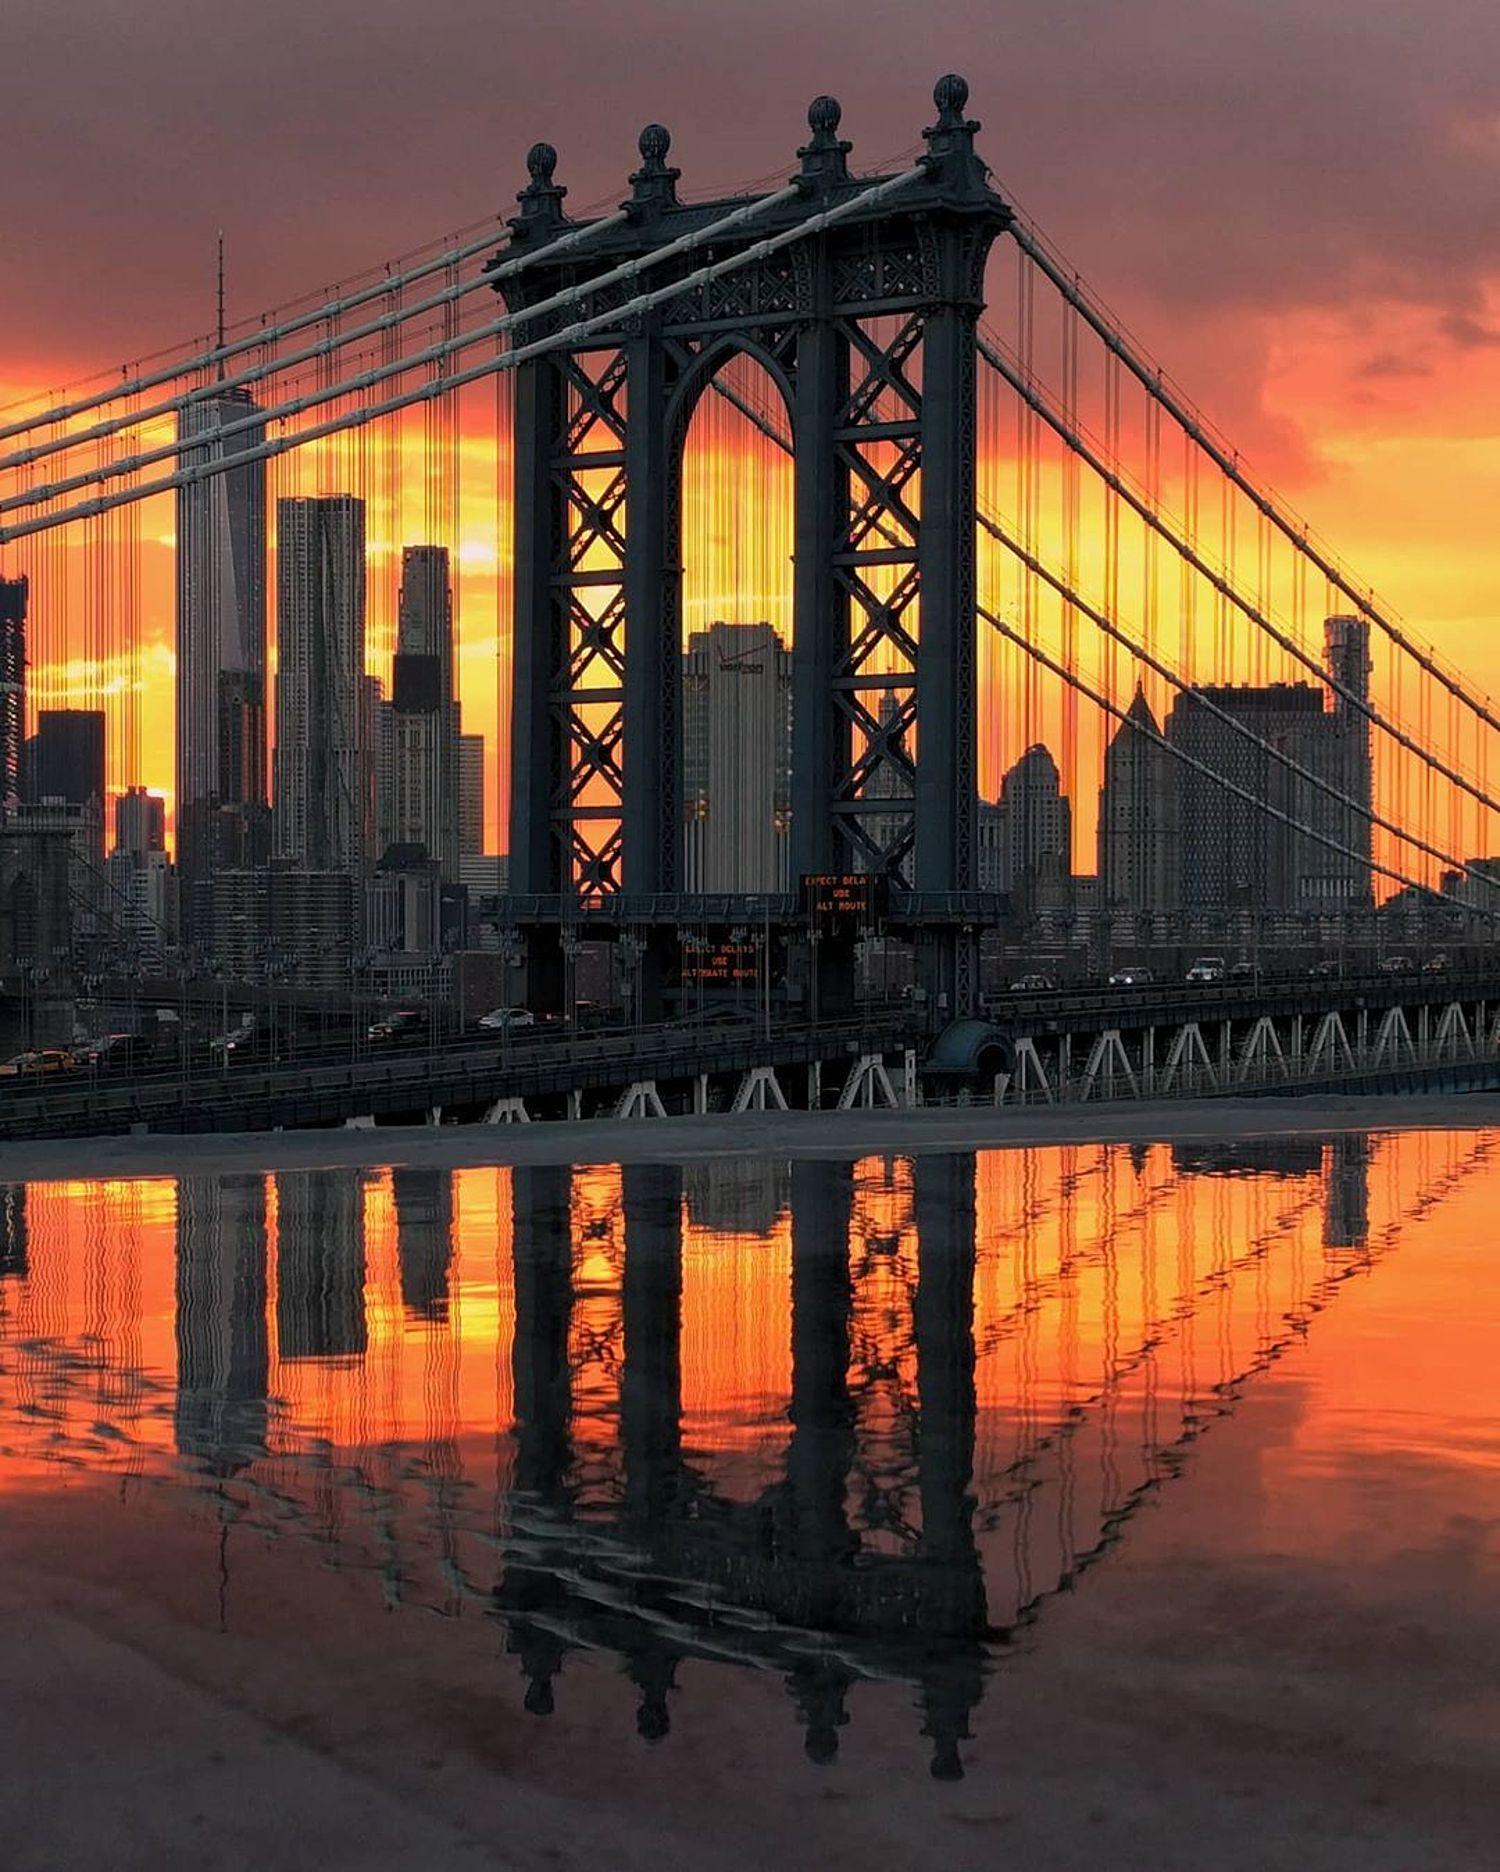 Sunset over Manhattan Bridge, DUMBO, Brooklyn